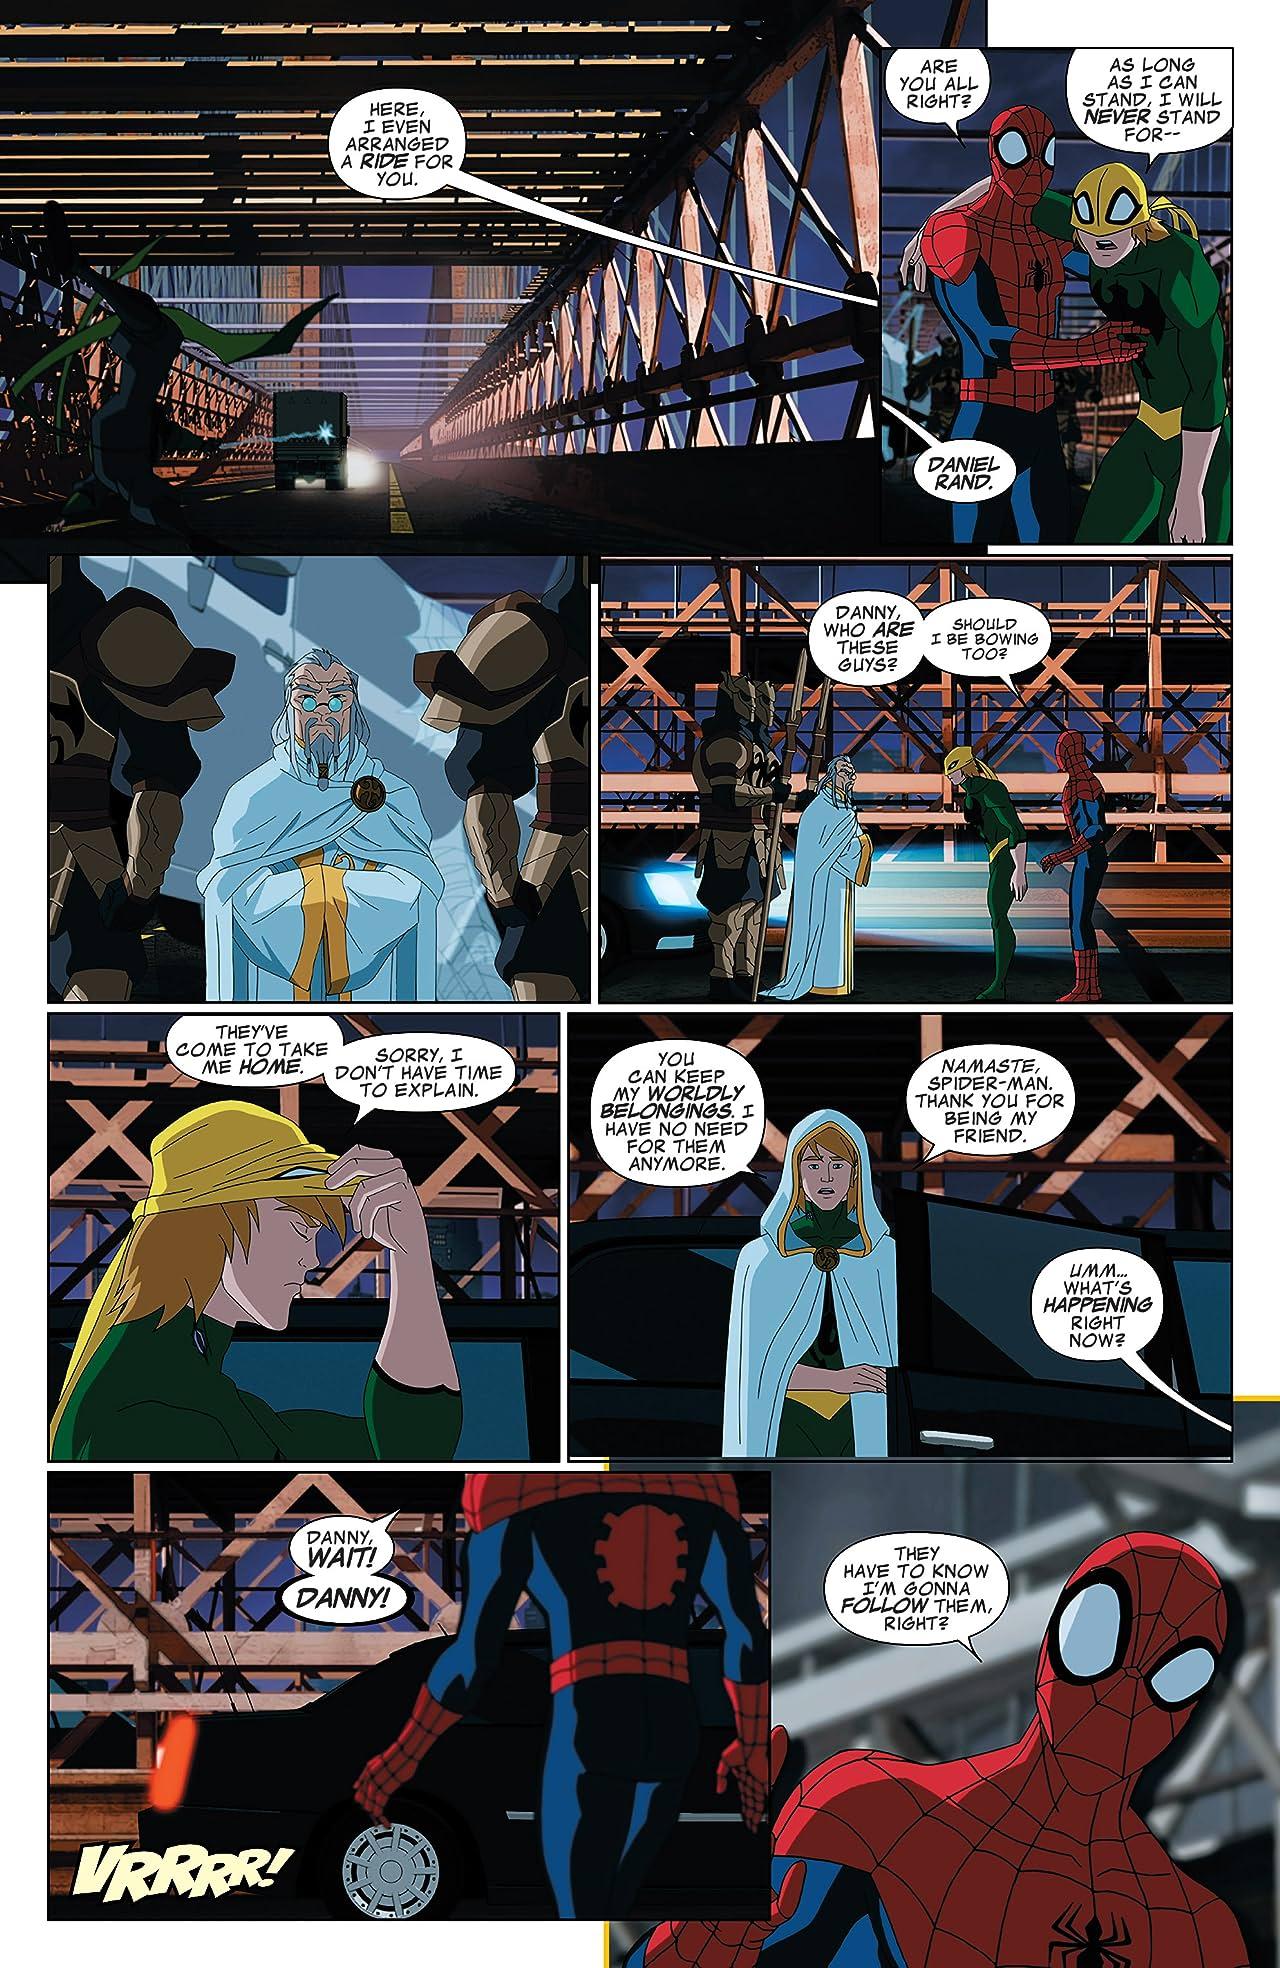 Marvel Universe Ultimate Spider-Man: Web Warriors Vol. 2